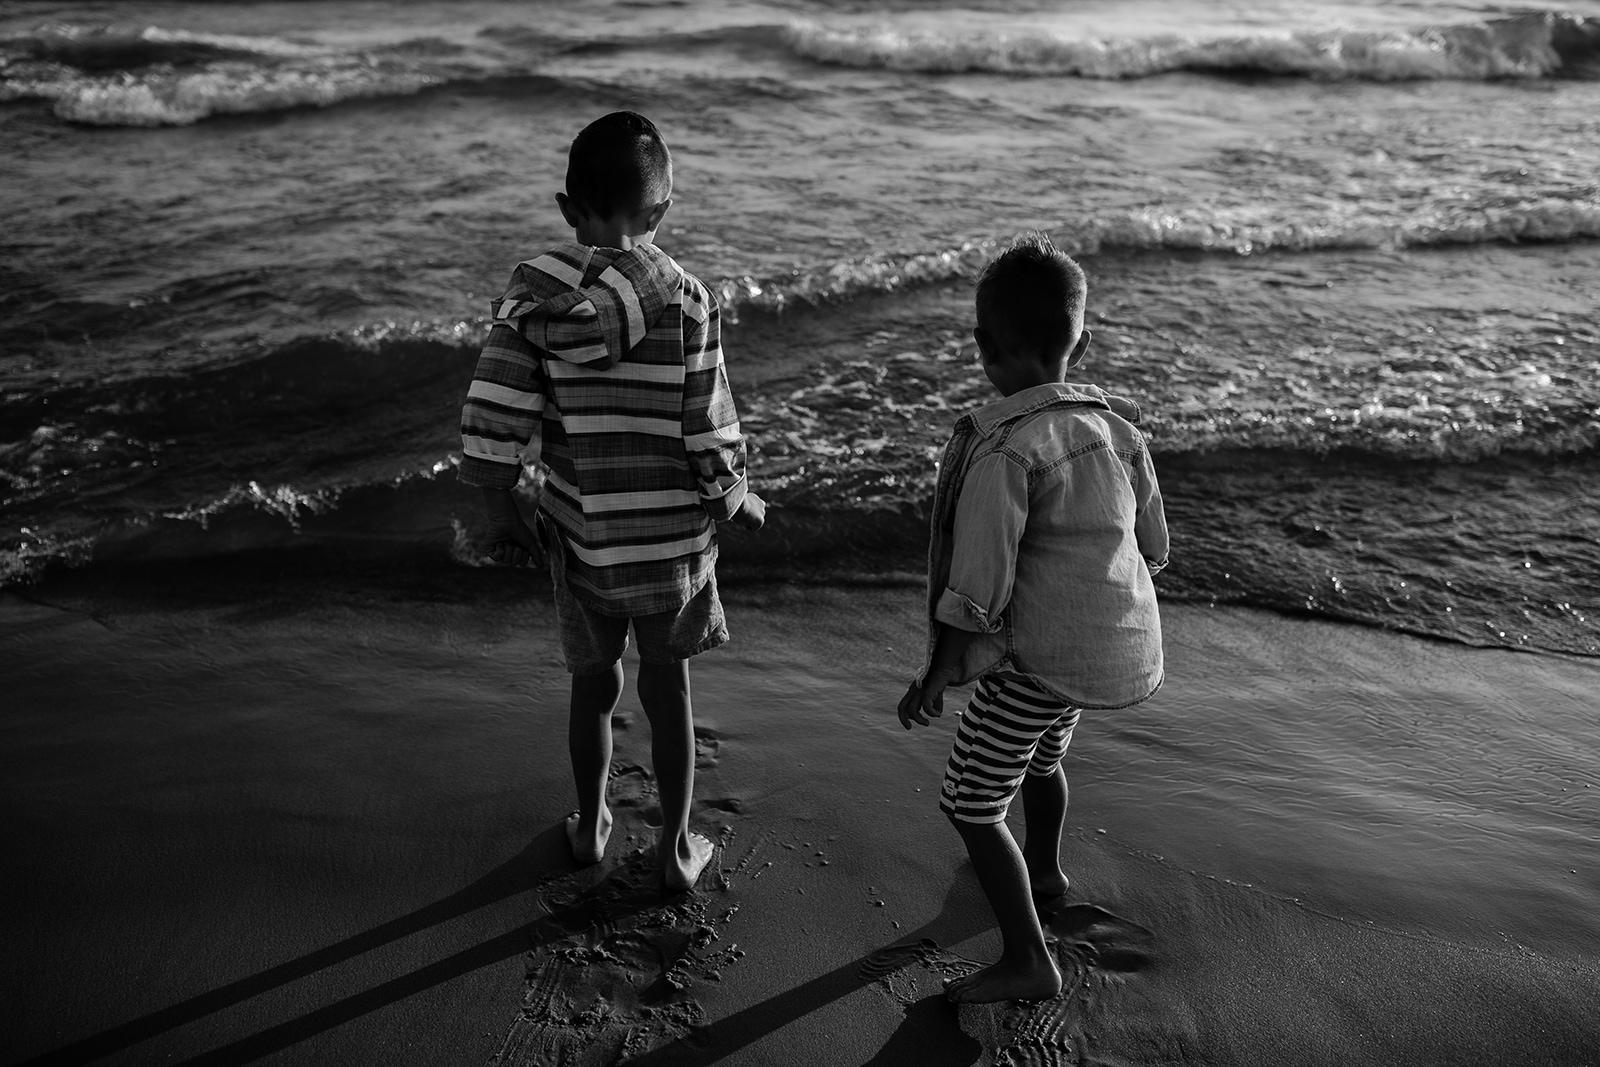 michigan-storytelling-photographer-ludington-mi-state-park-andrews-family-sunset-session-124.jpg